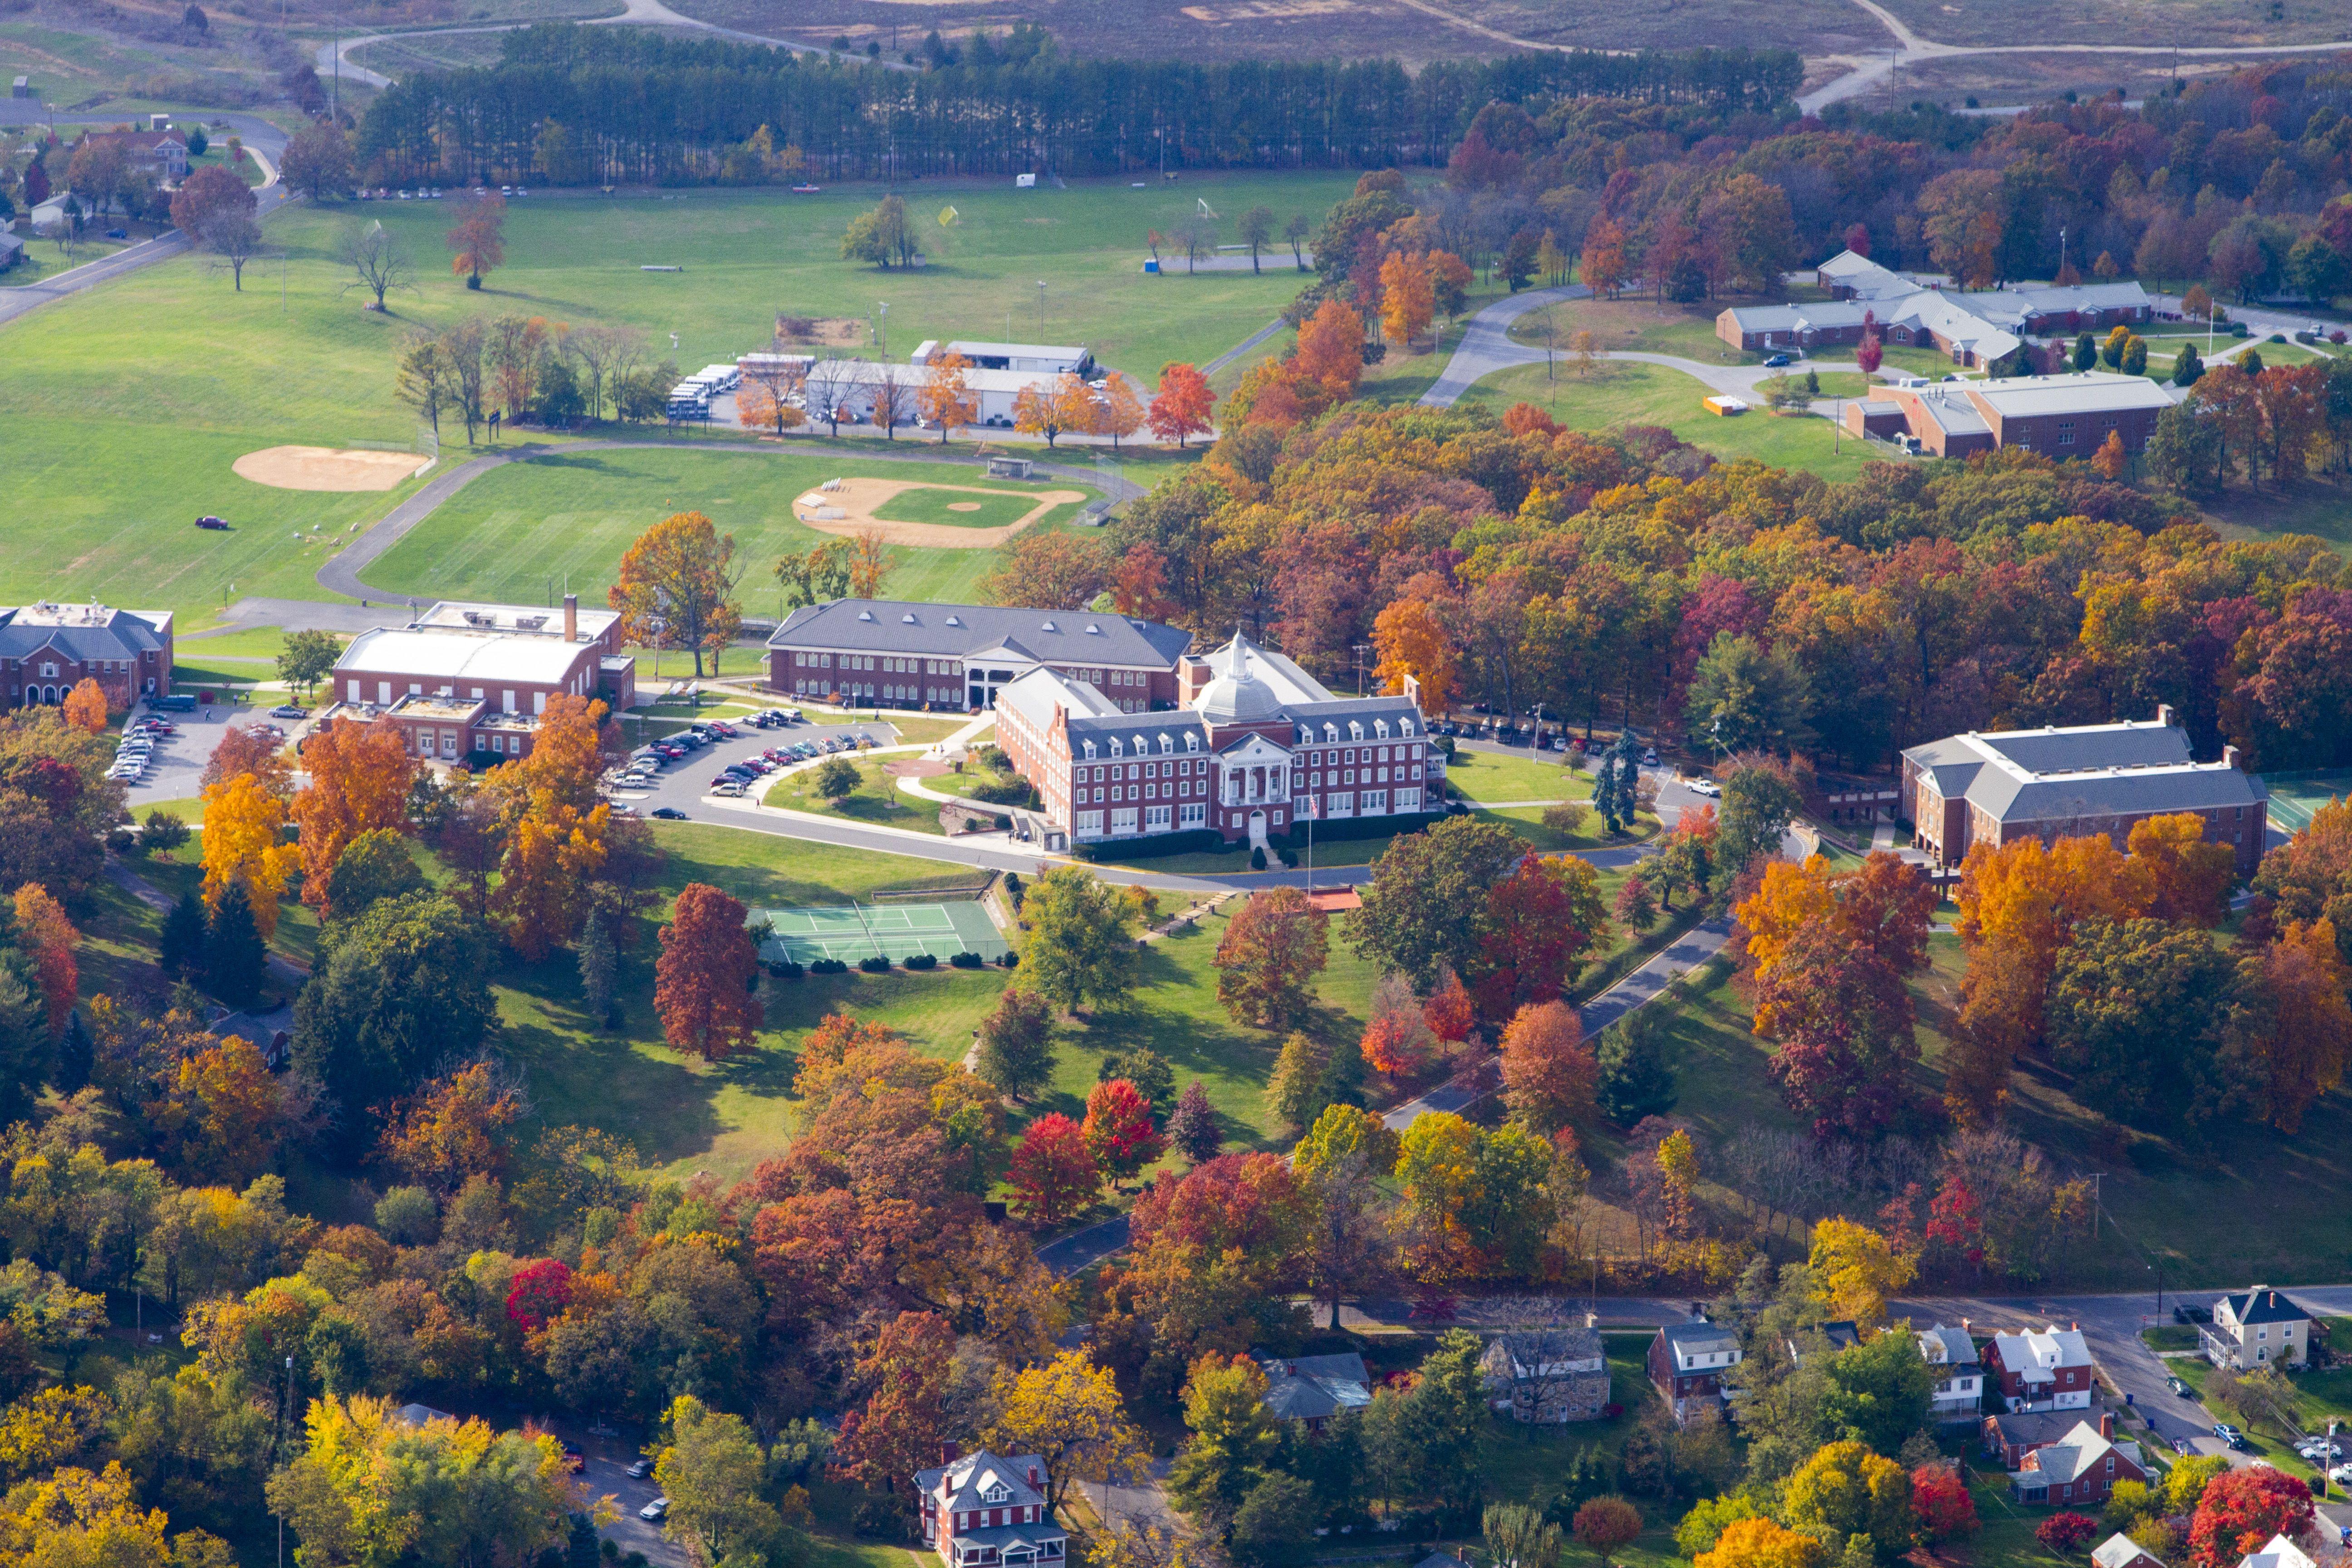 A fantastic aerial shot of rmas sprawling campus located